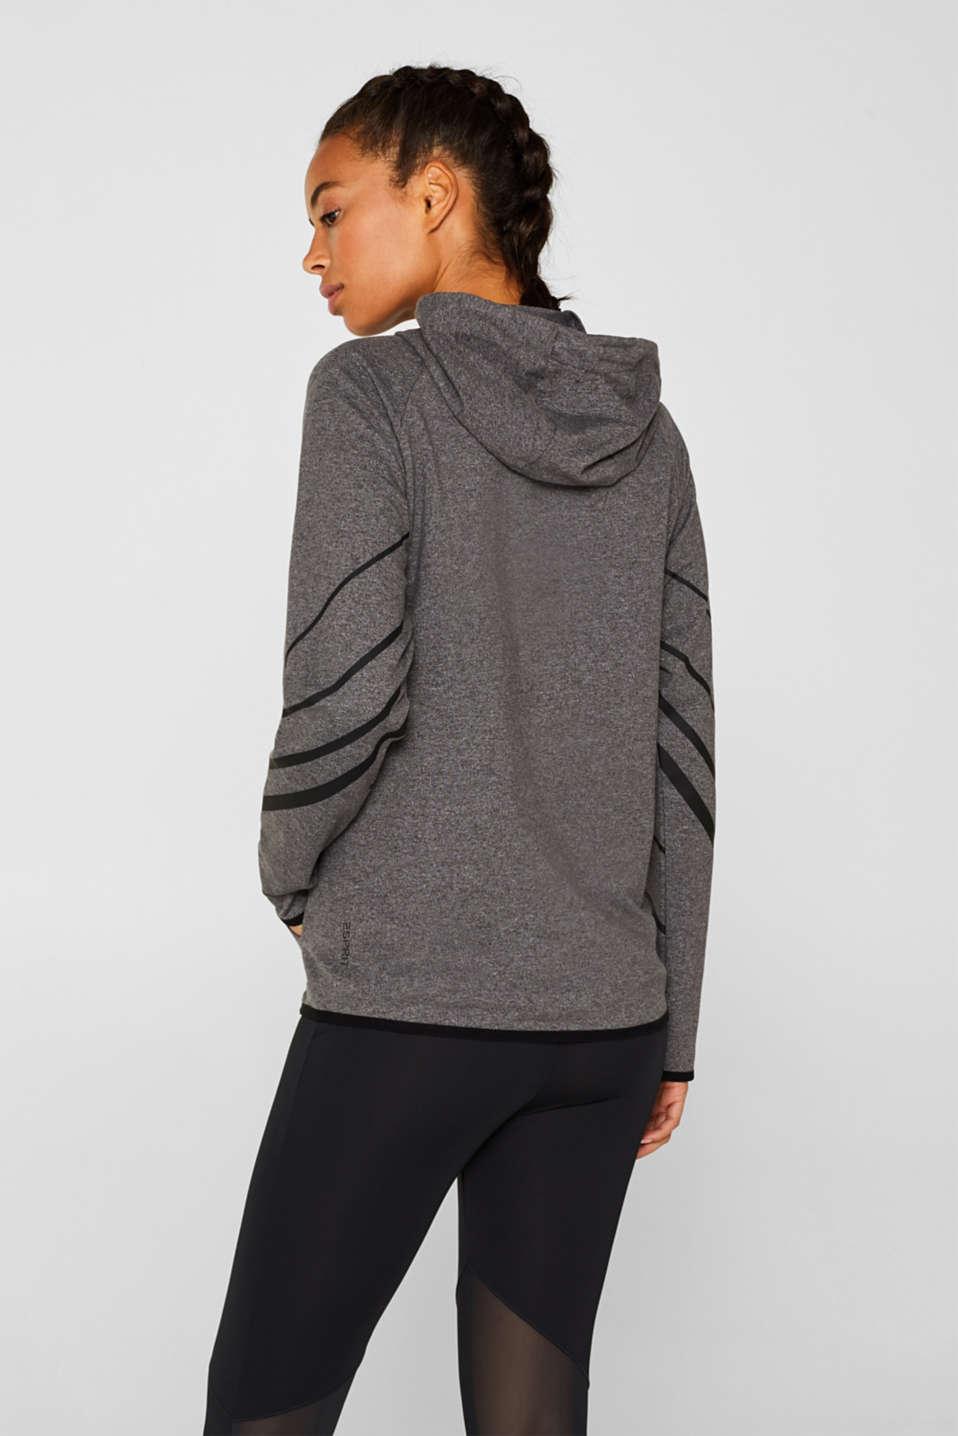 Hooded sweatshirt cardigan, ANTHRACITE 2, detail image number 2